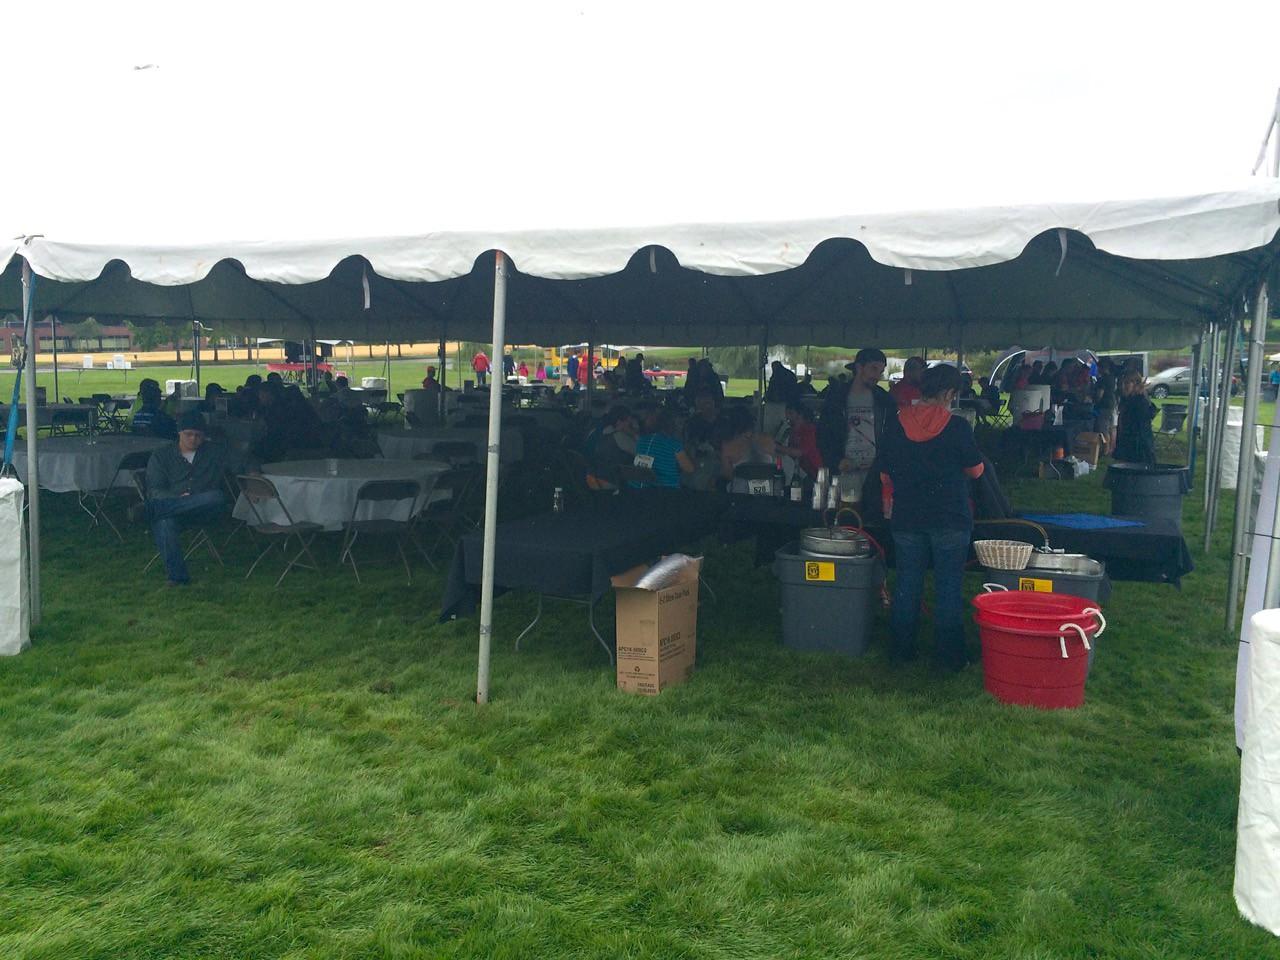 2015 Tour de Cure Oregon, Amberglen Park, Hillsboro.<br /> Food tents